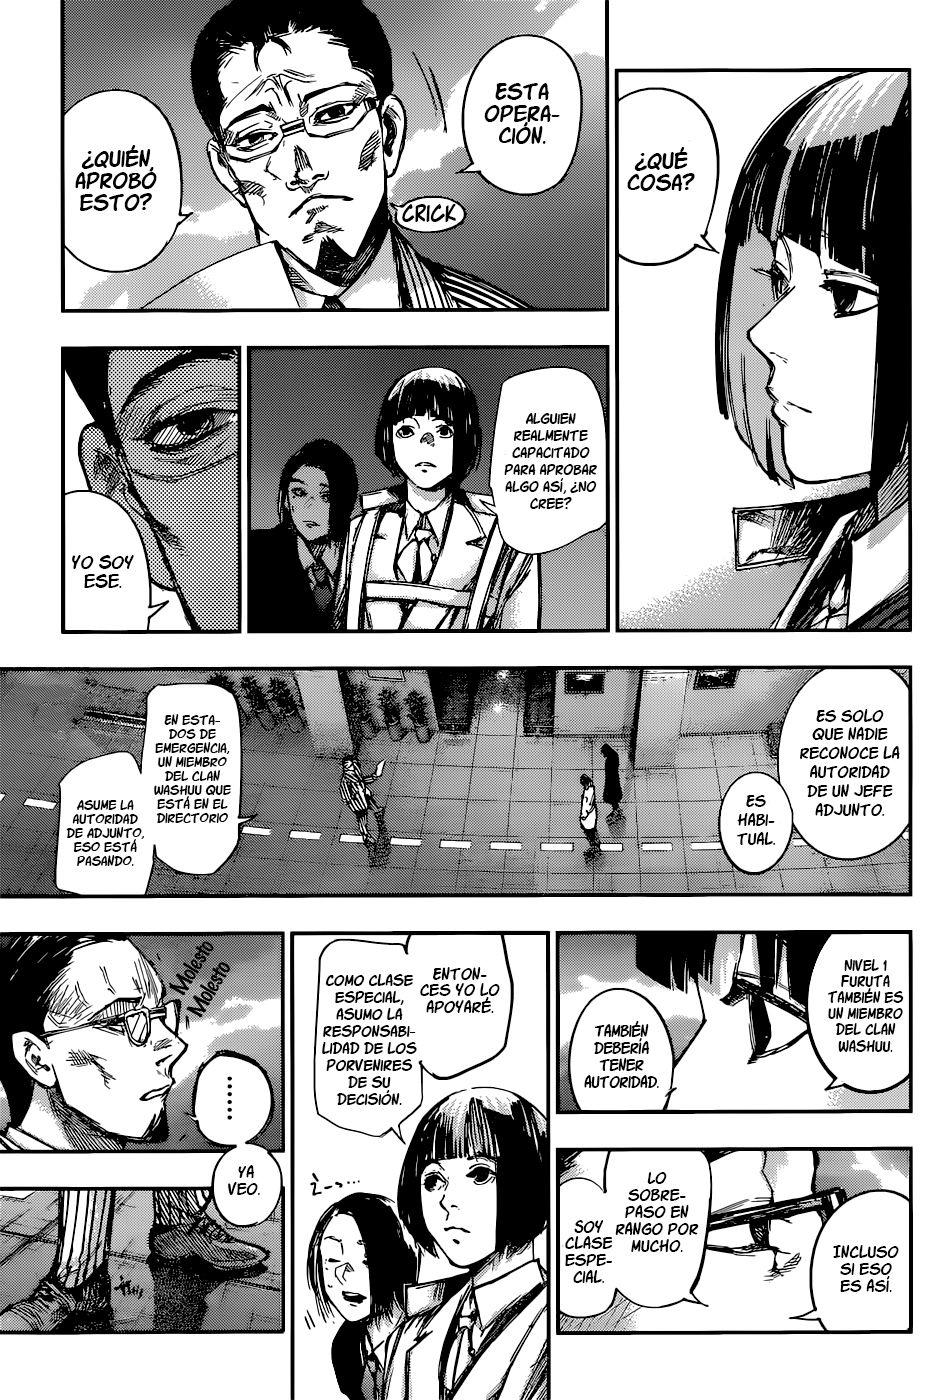 http://c5.ninemanga.com/es_manga/pic2/59/59/525294/8a14b82d2920257eab416dd8615d5a4b.jpg Page 10